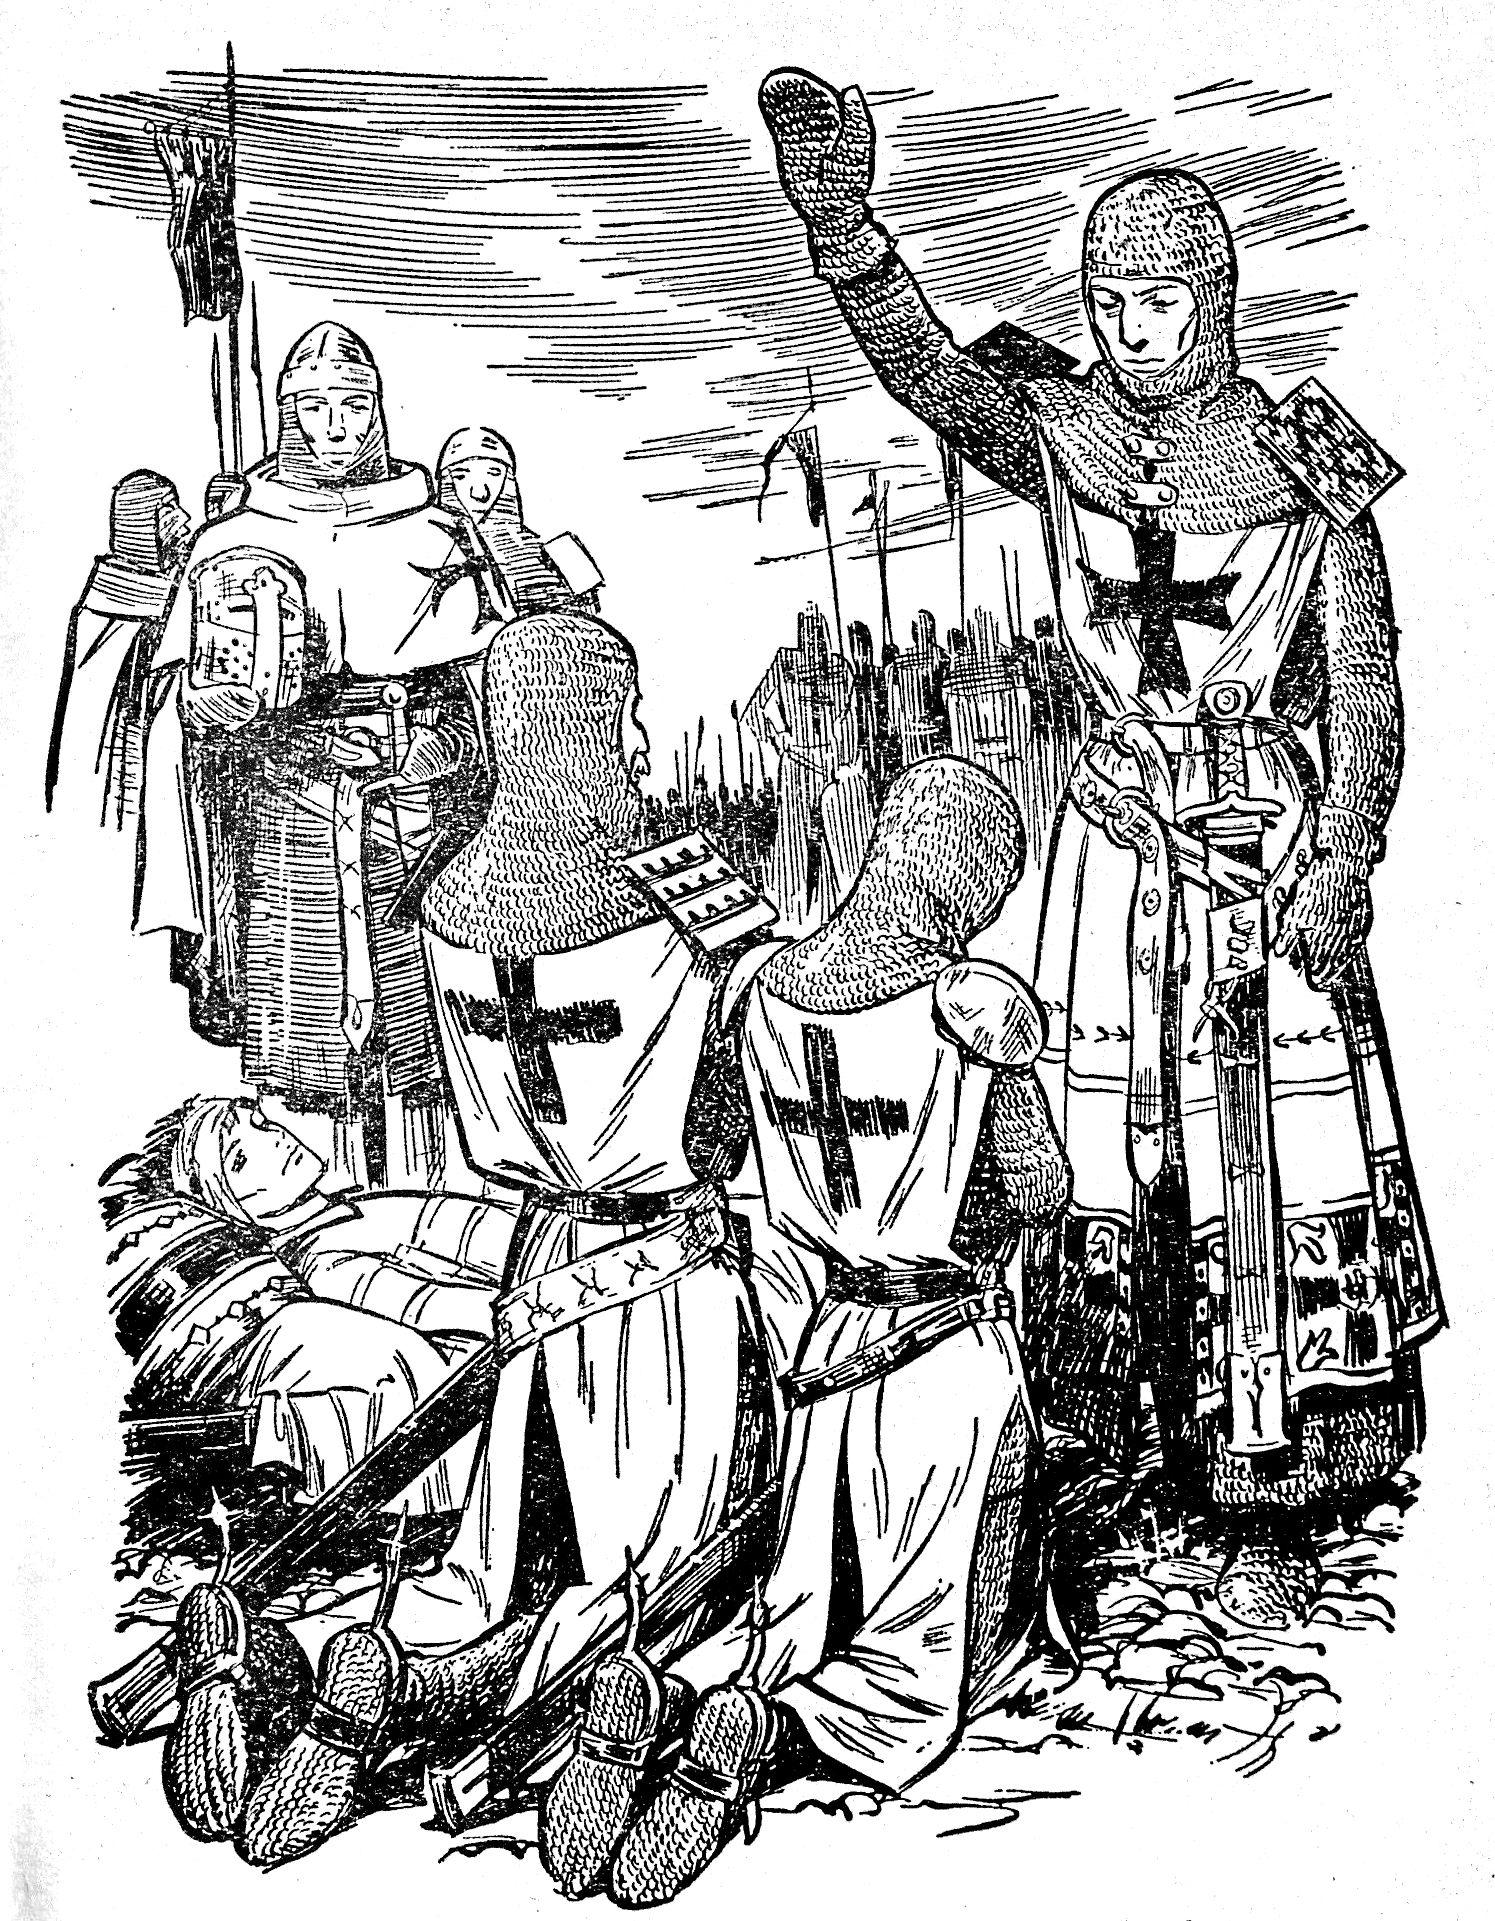 Adoubements - Le chevalier ménestrel | soldados | Pinterest ...